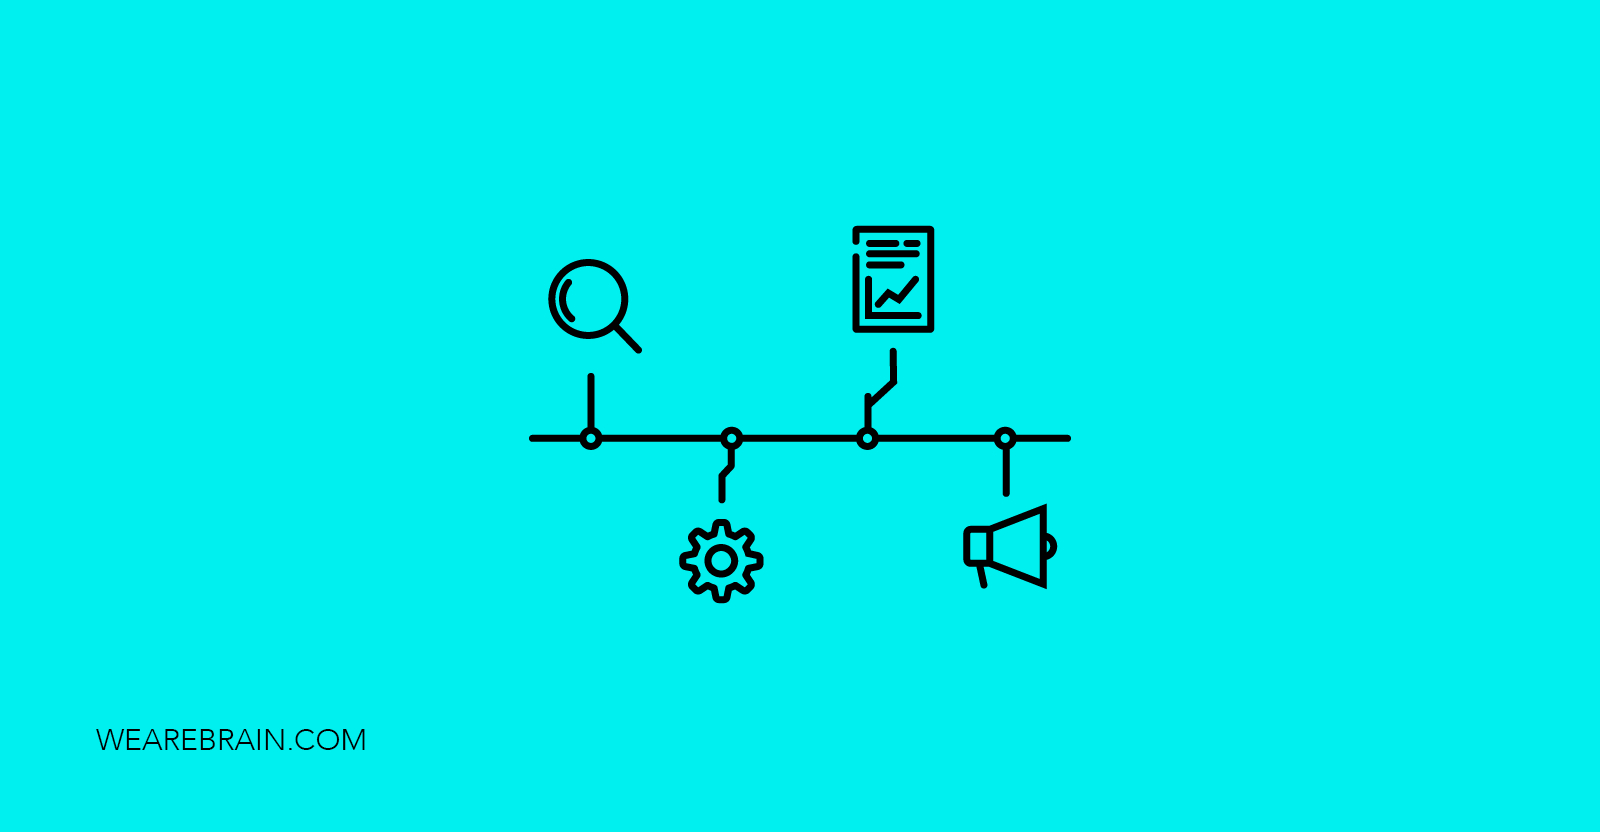 illustration of a roadmap